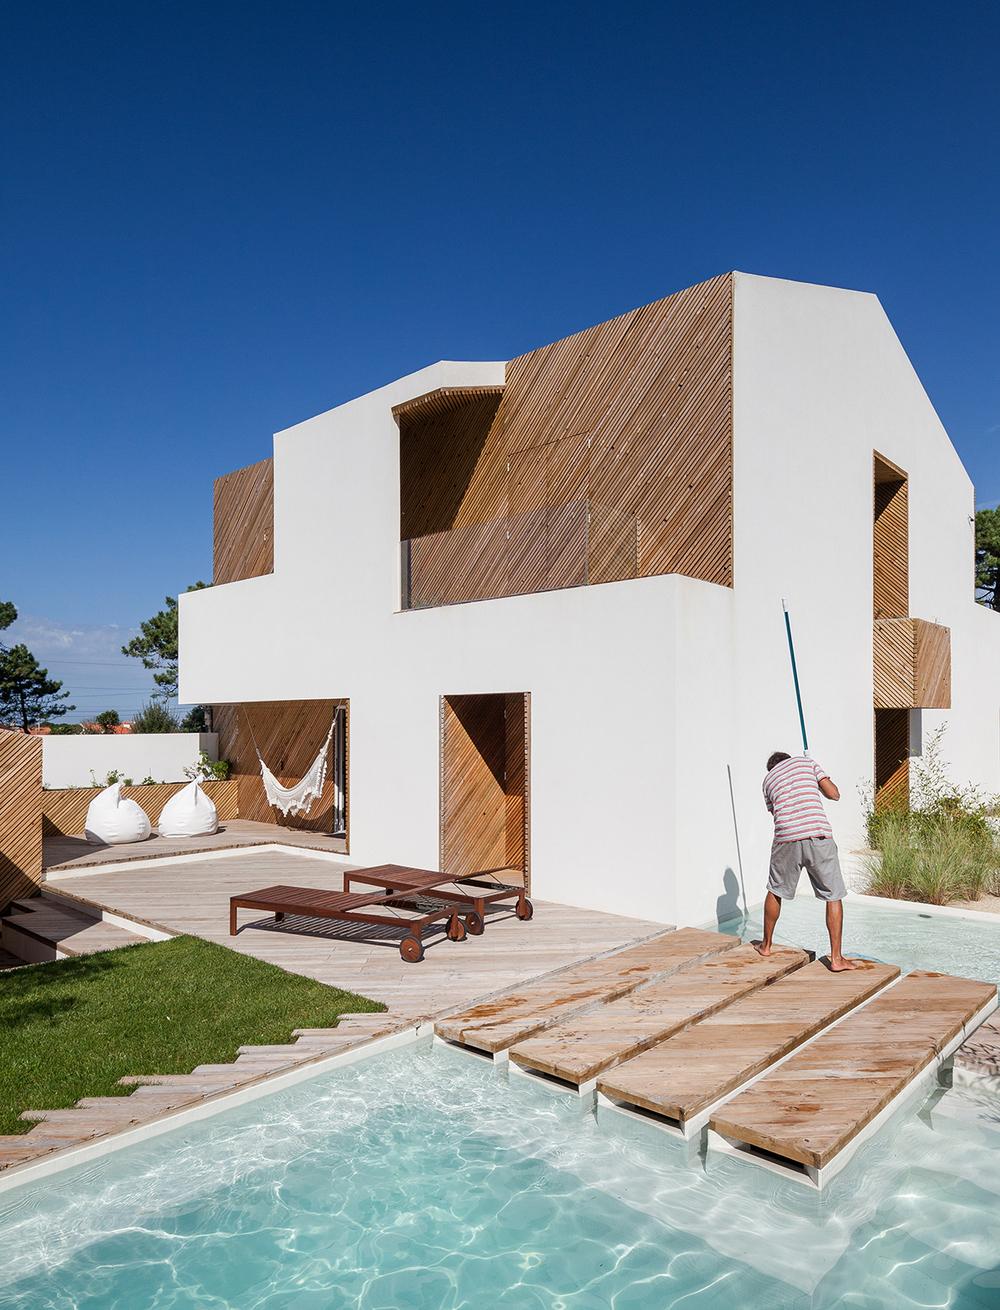 SilverWoodHouse Designed by Ernesto Pereira